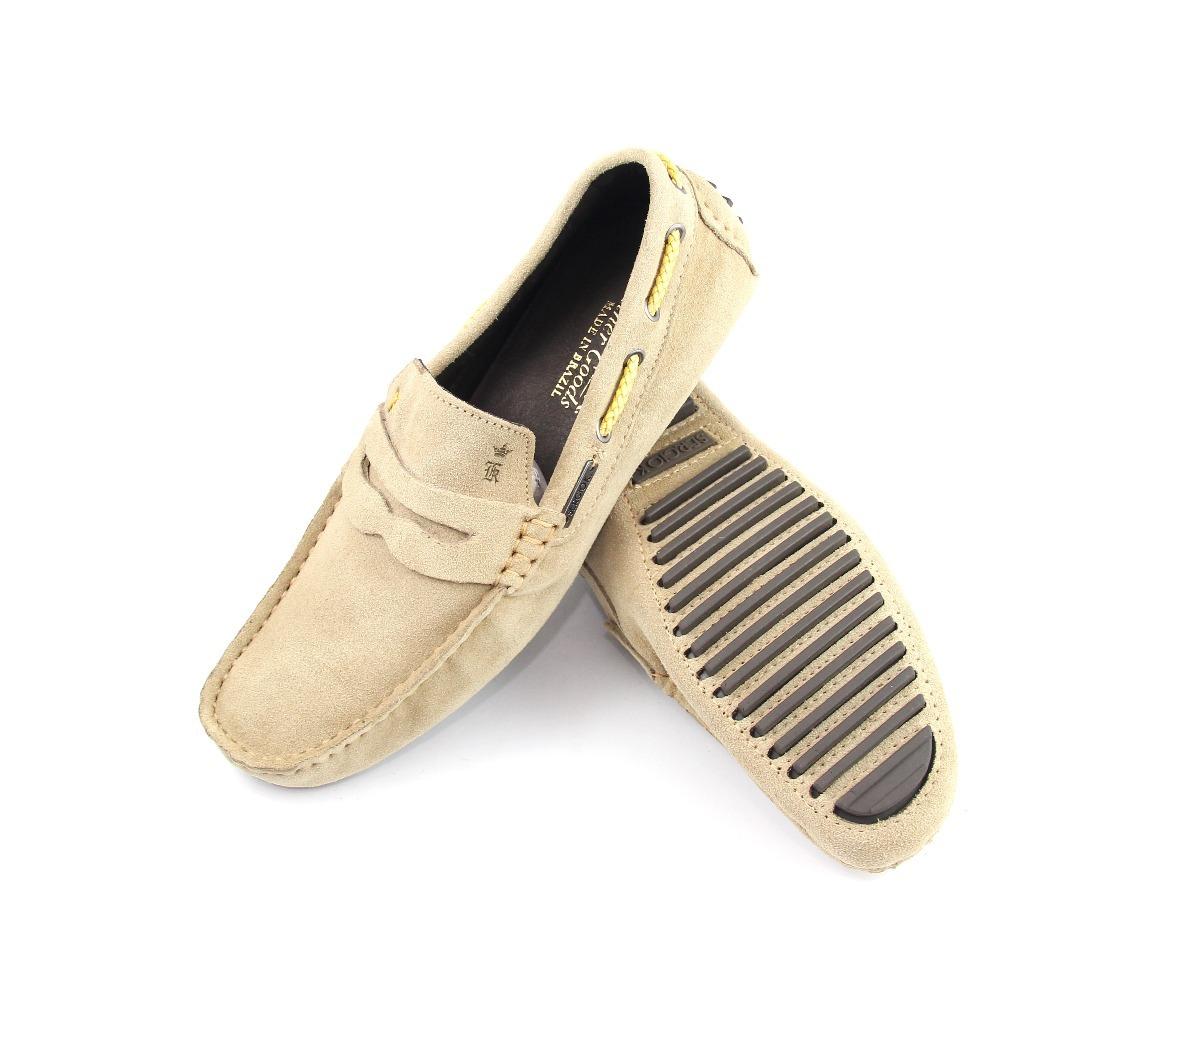 98004e443f sapato mocassim masculino sergio k original bege de couro. Carregando zoom.